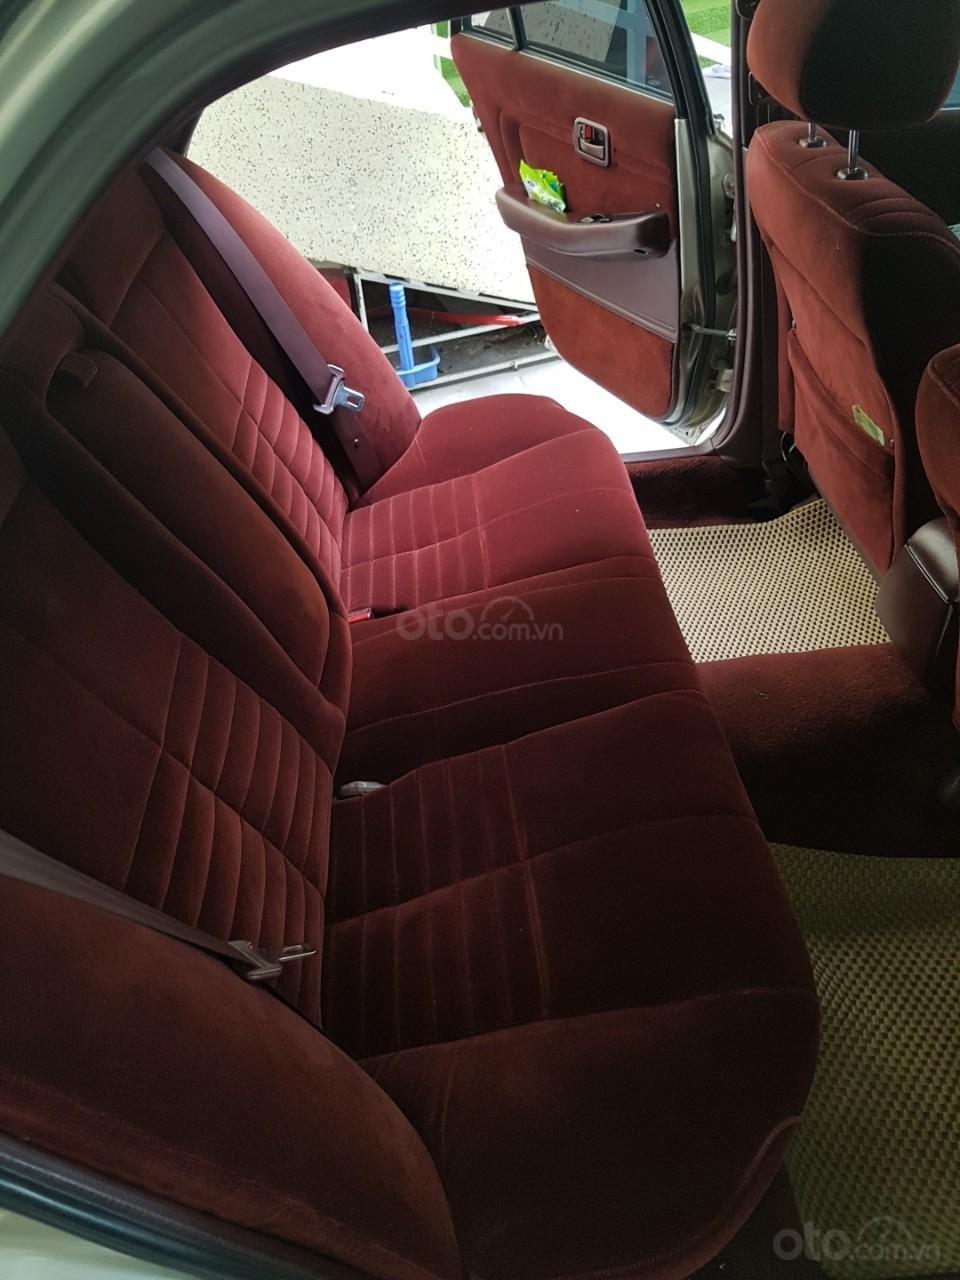 Toyota Cressida 2.4 đời 1996 (7)